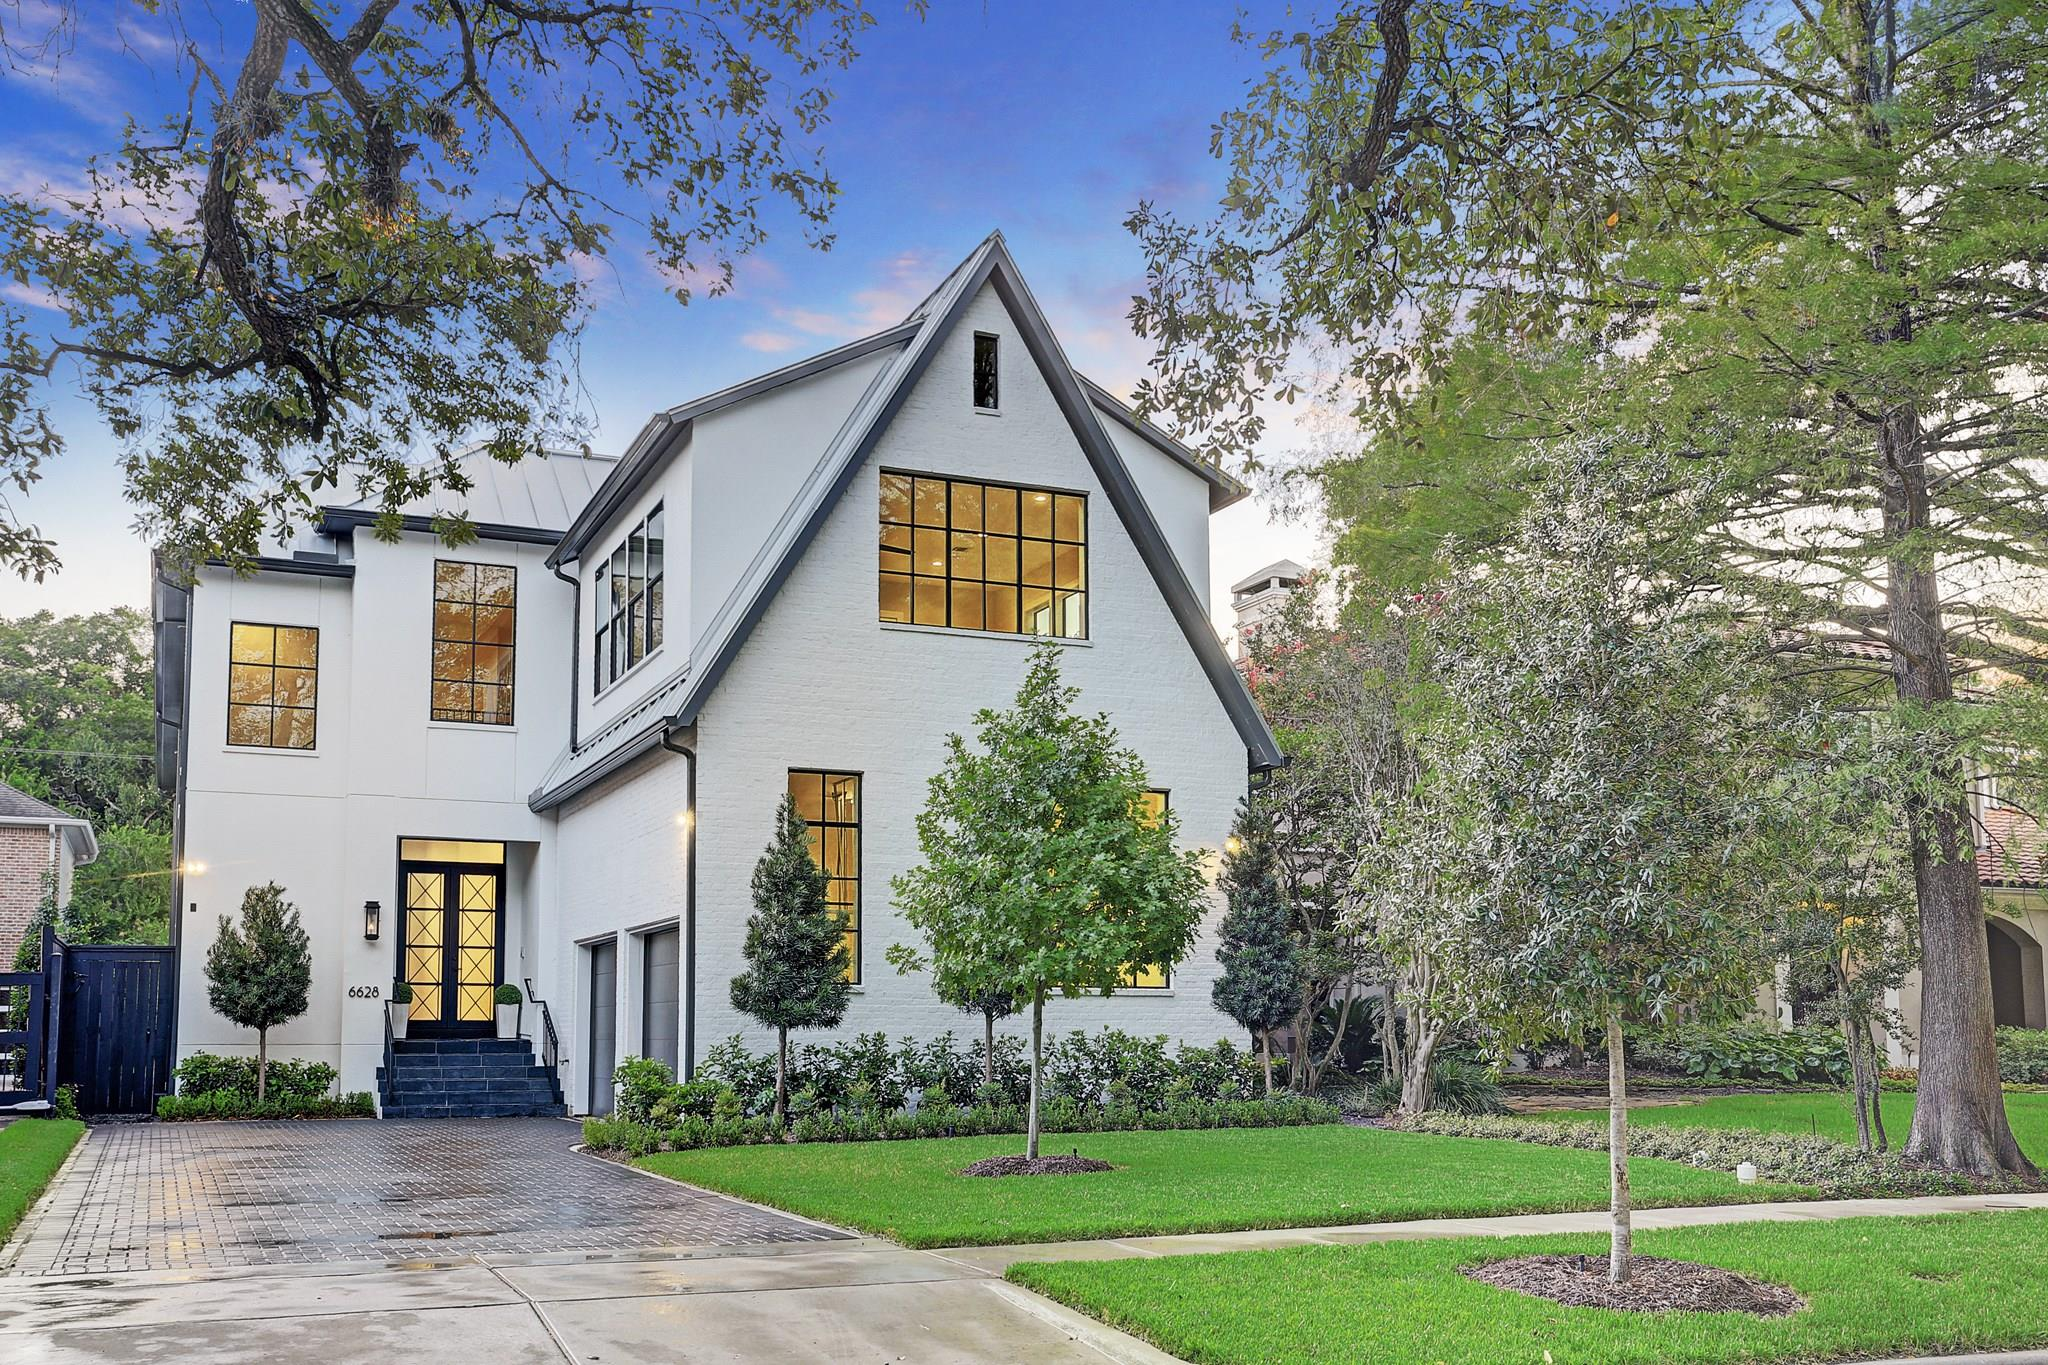 6628 Vanderbilt Street Property Photo - West University Place, TX real estate listing